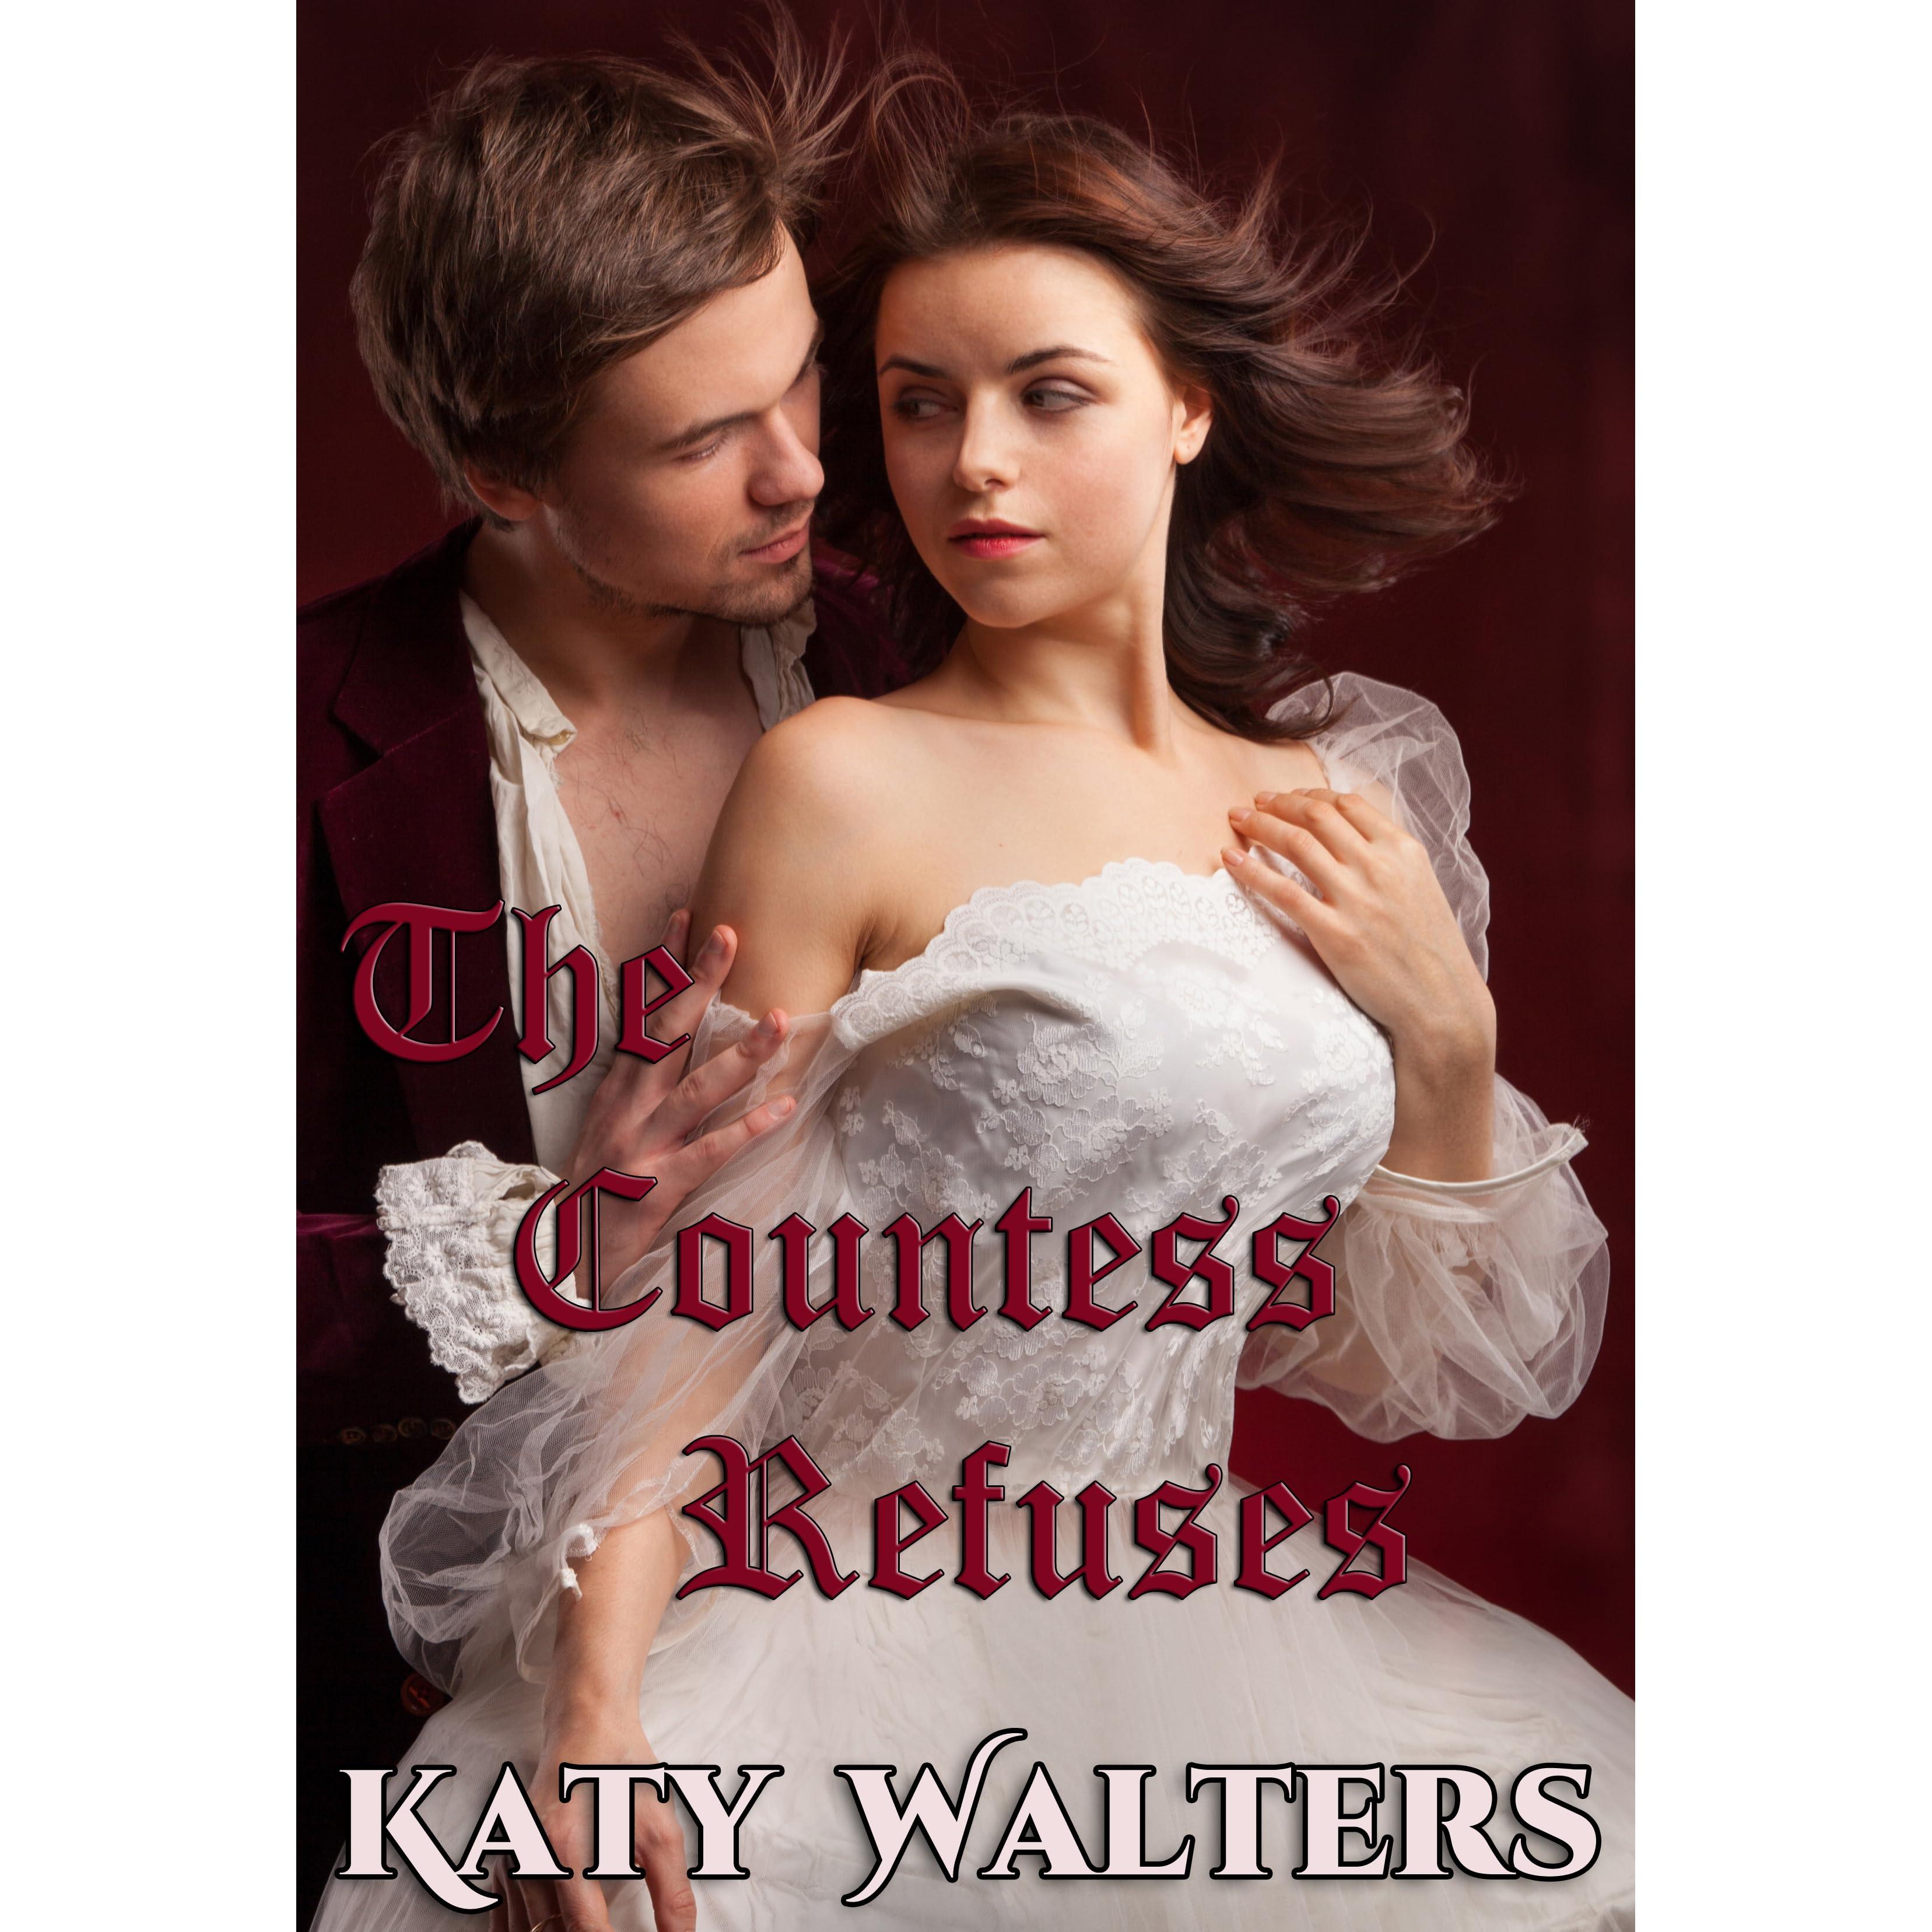 Katy Walters Nude Photos 1